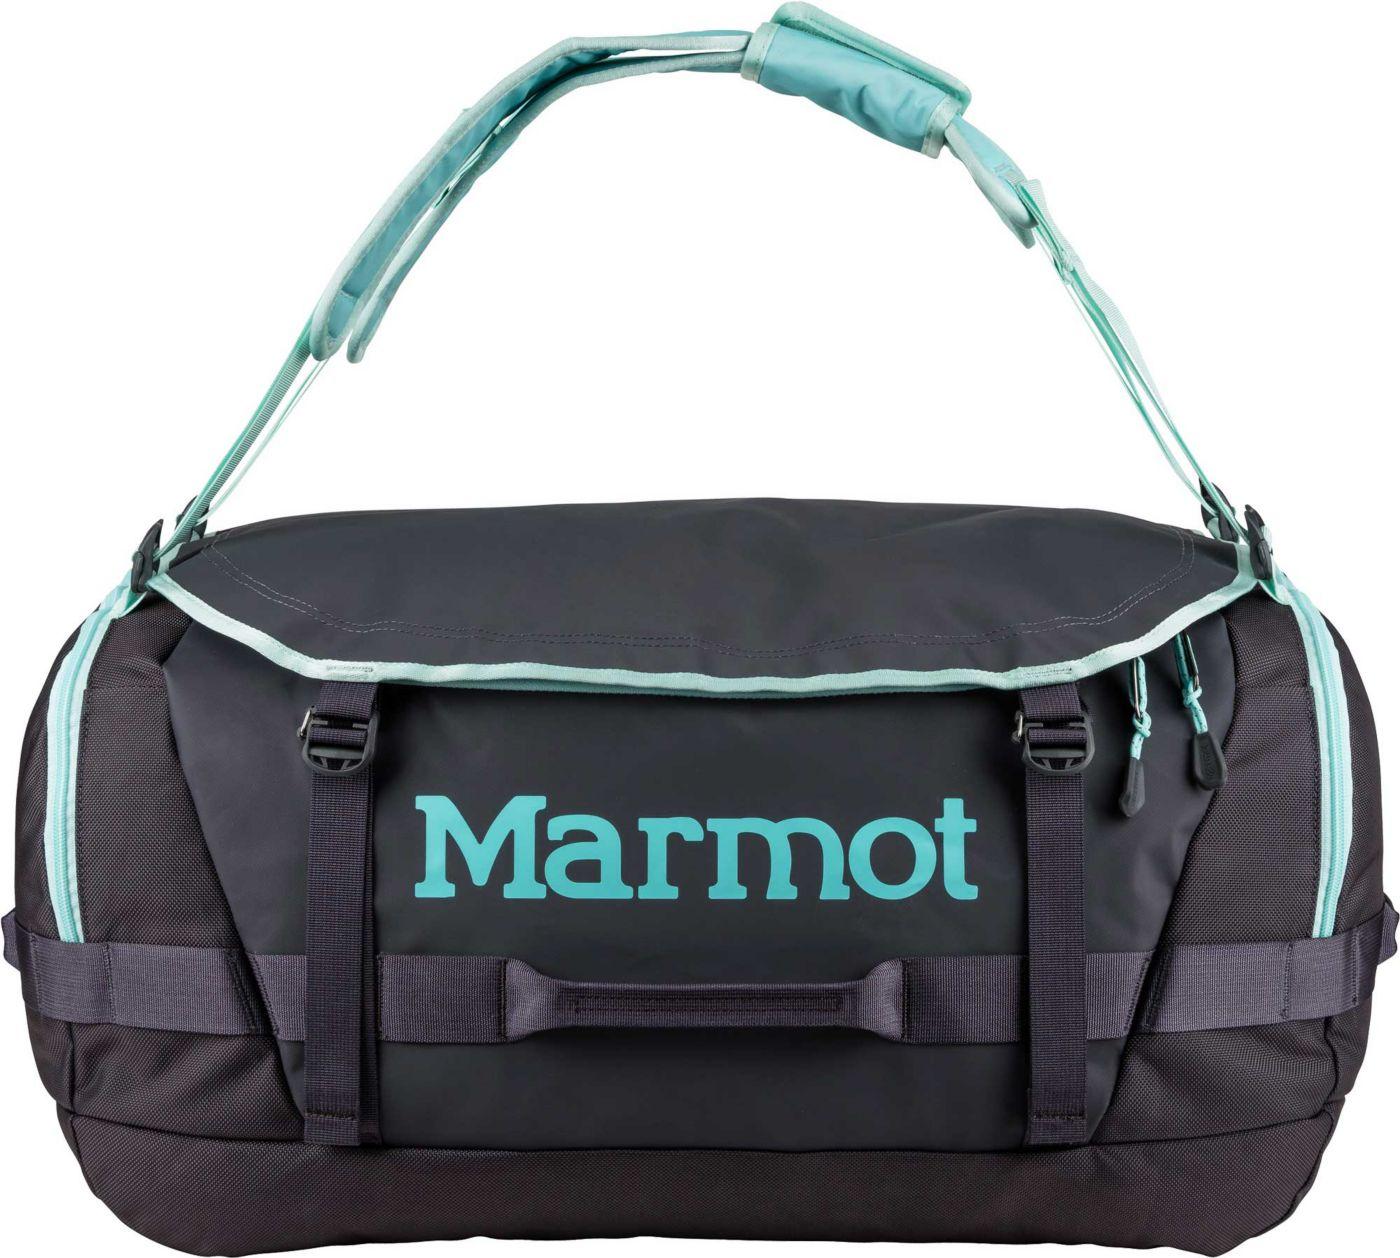 Marmot Long Hauler Large Duffel Bag  Dicks Sporting Goods-8772